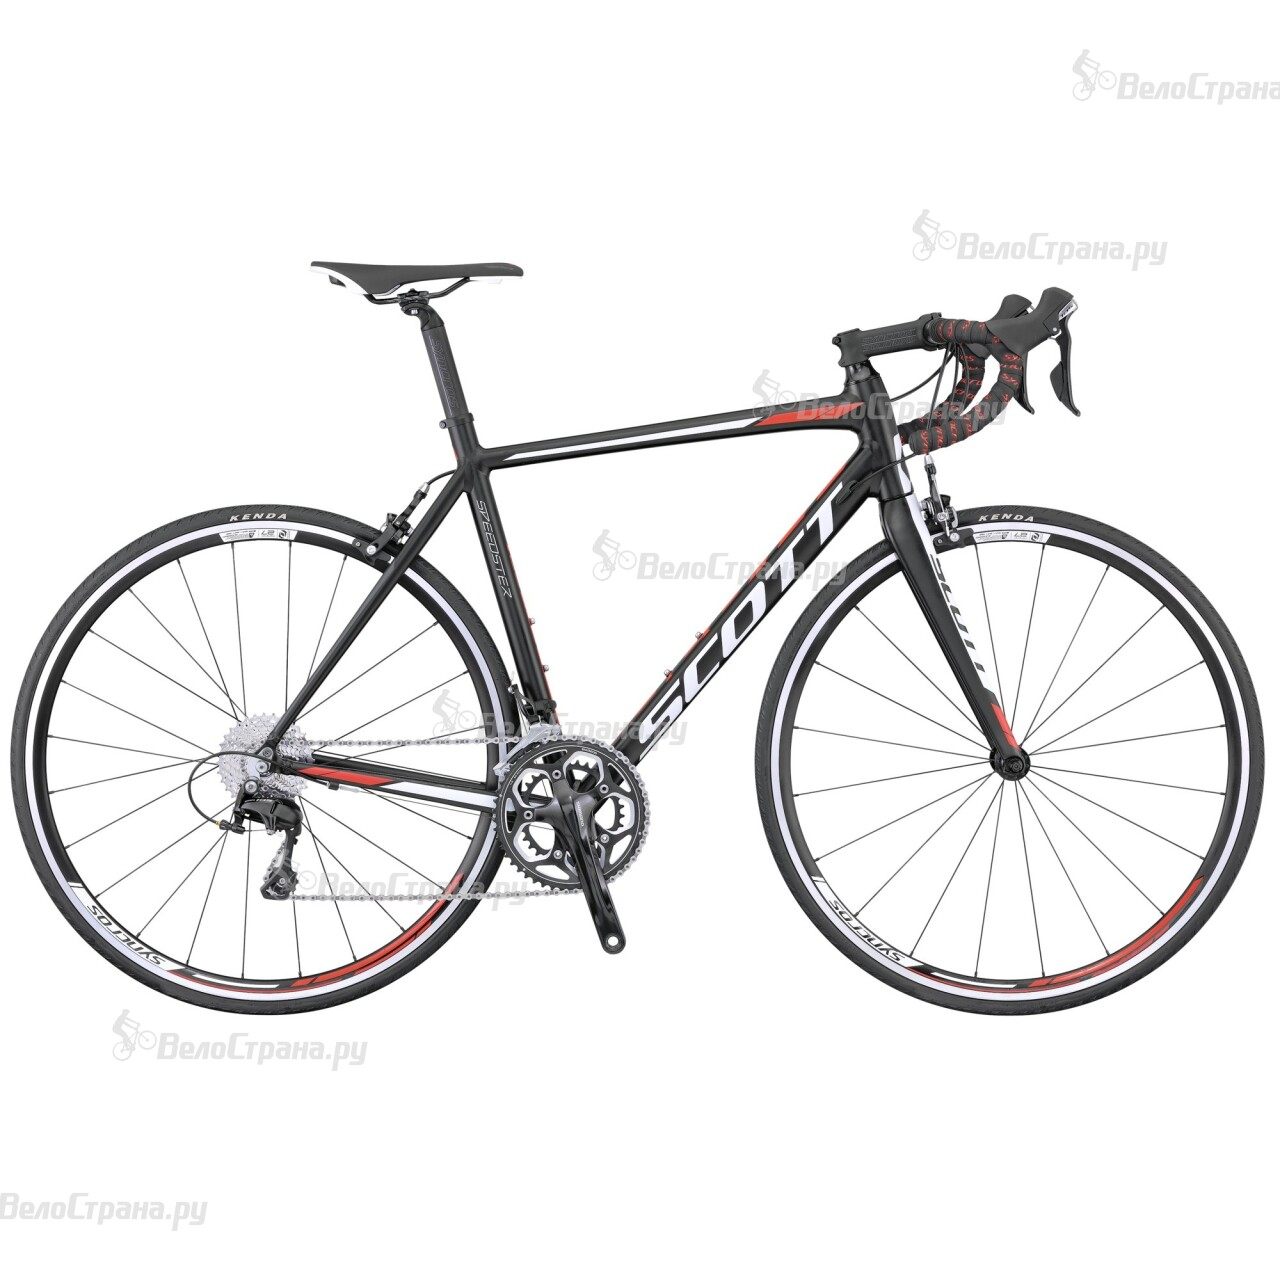 Велосипед Scott Speedster 20 (2016) велосипед scott speedster cx 20 disc 28 2016